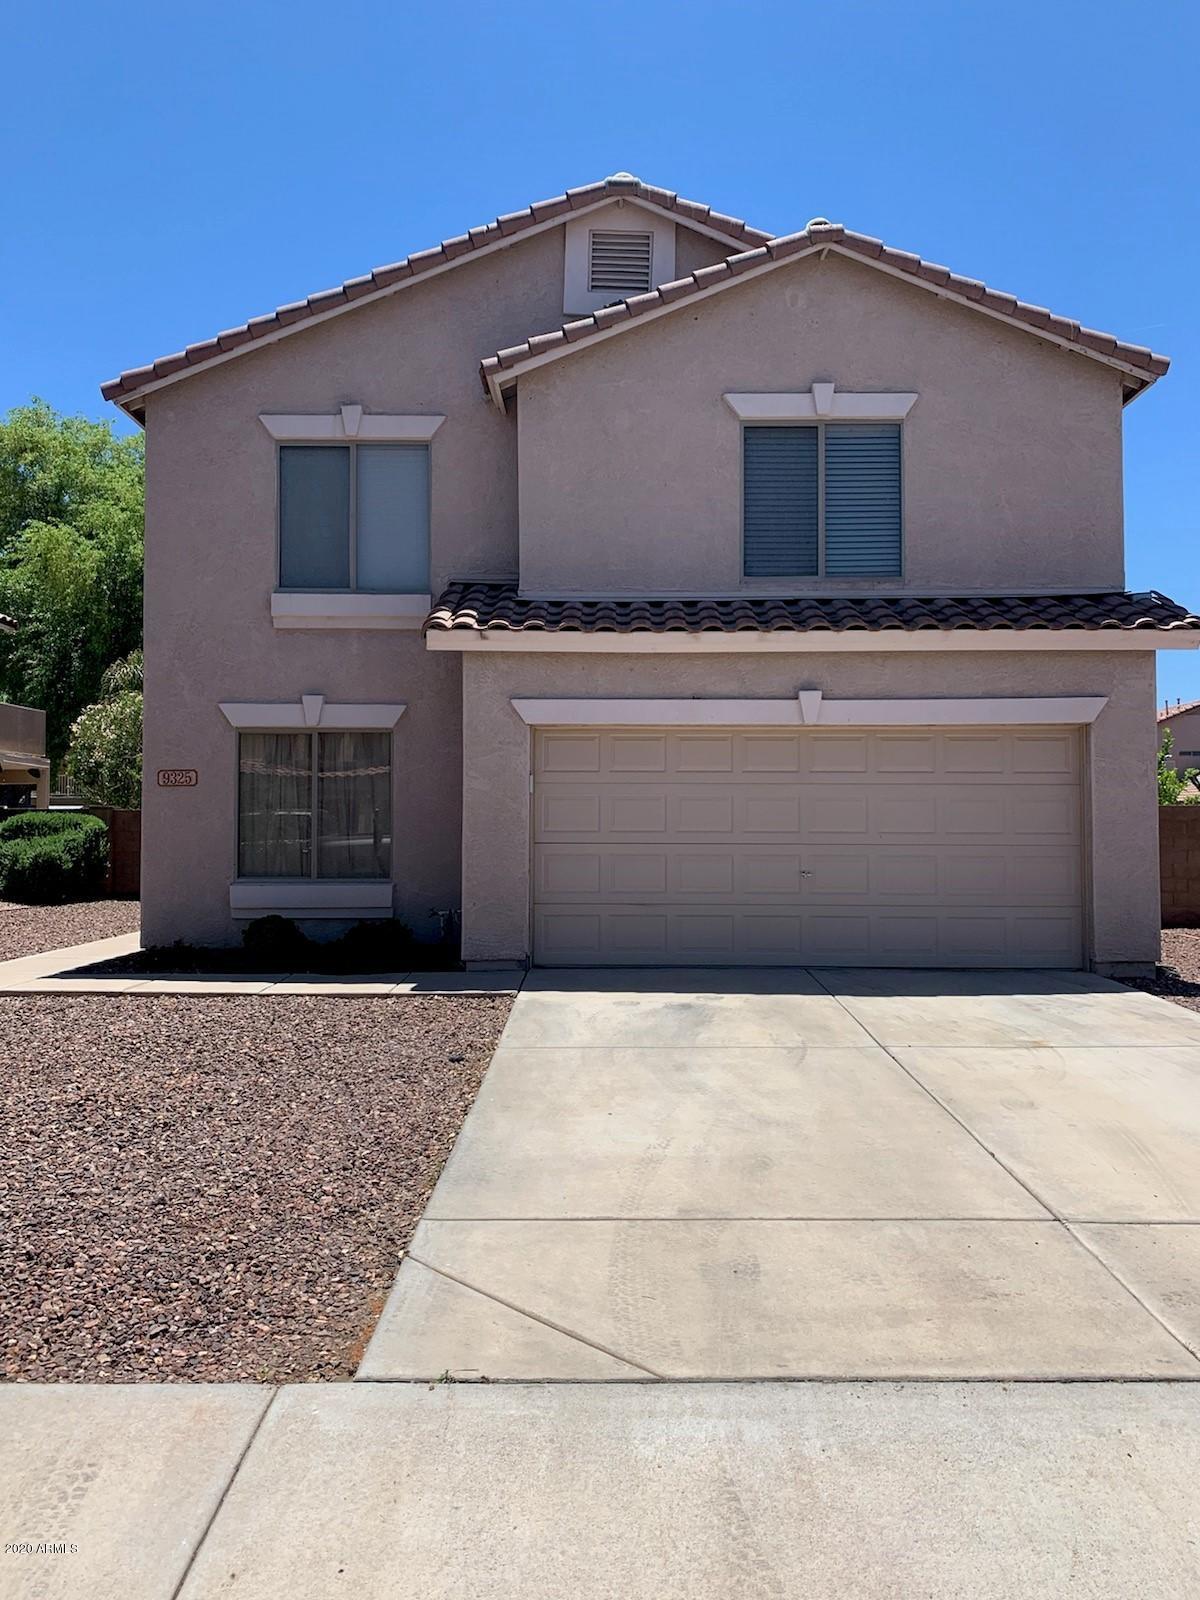 9325 W VOGEL Avenue, Peoria, AZ 85345